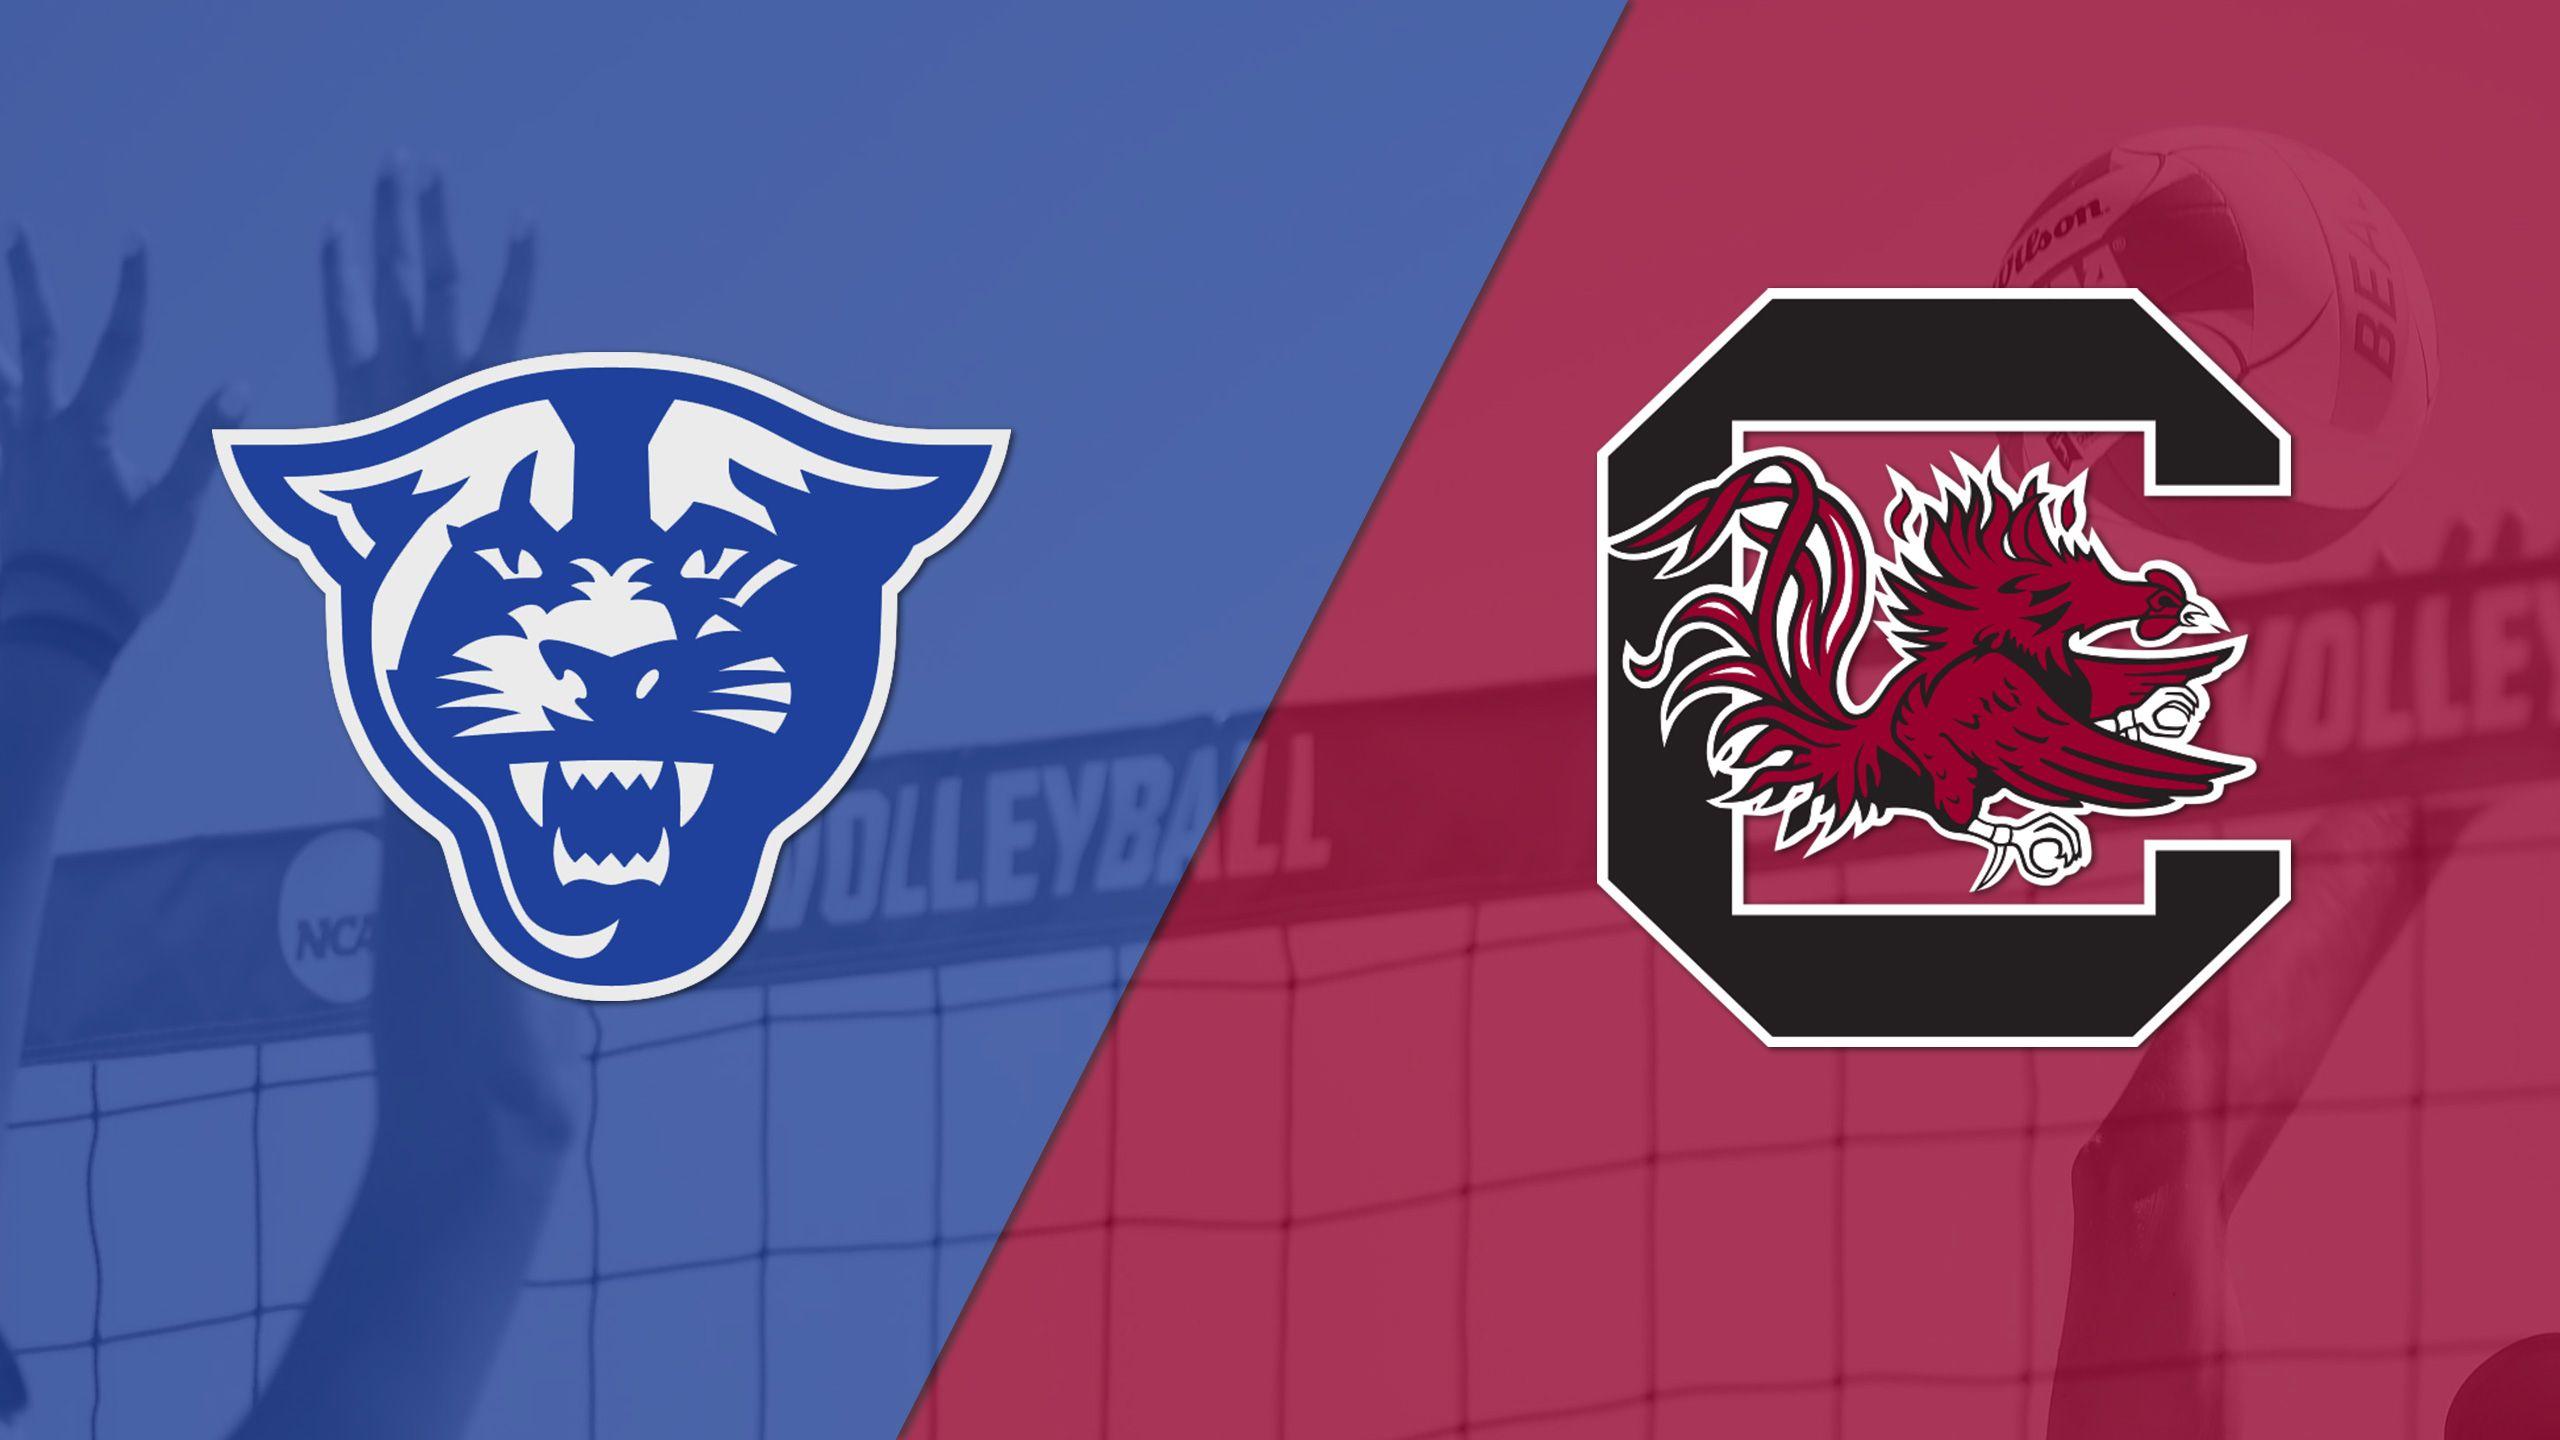 Georgia State vs. South Carolina (Beach Volleyball)